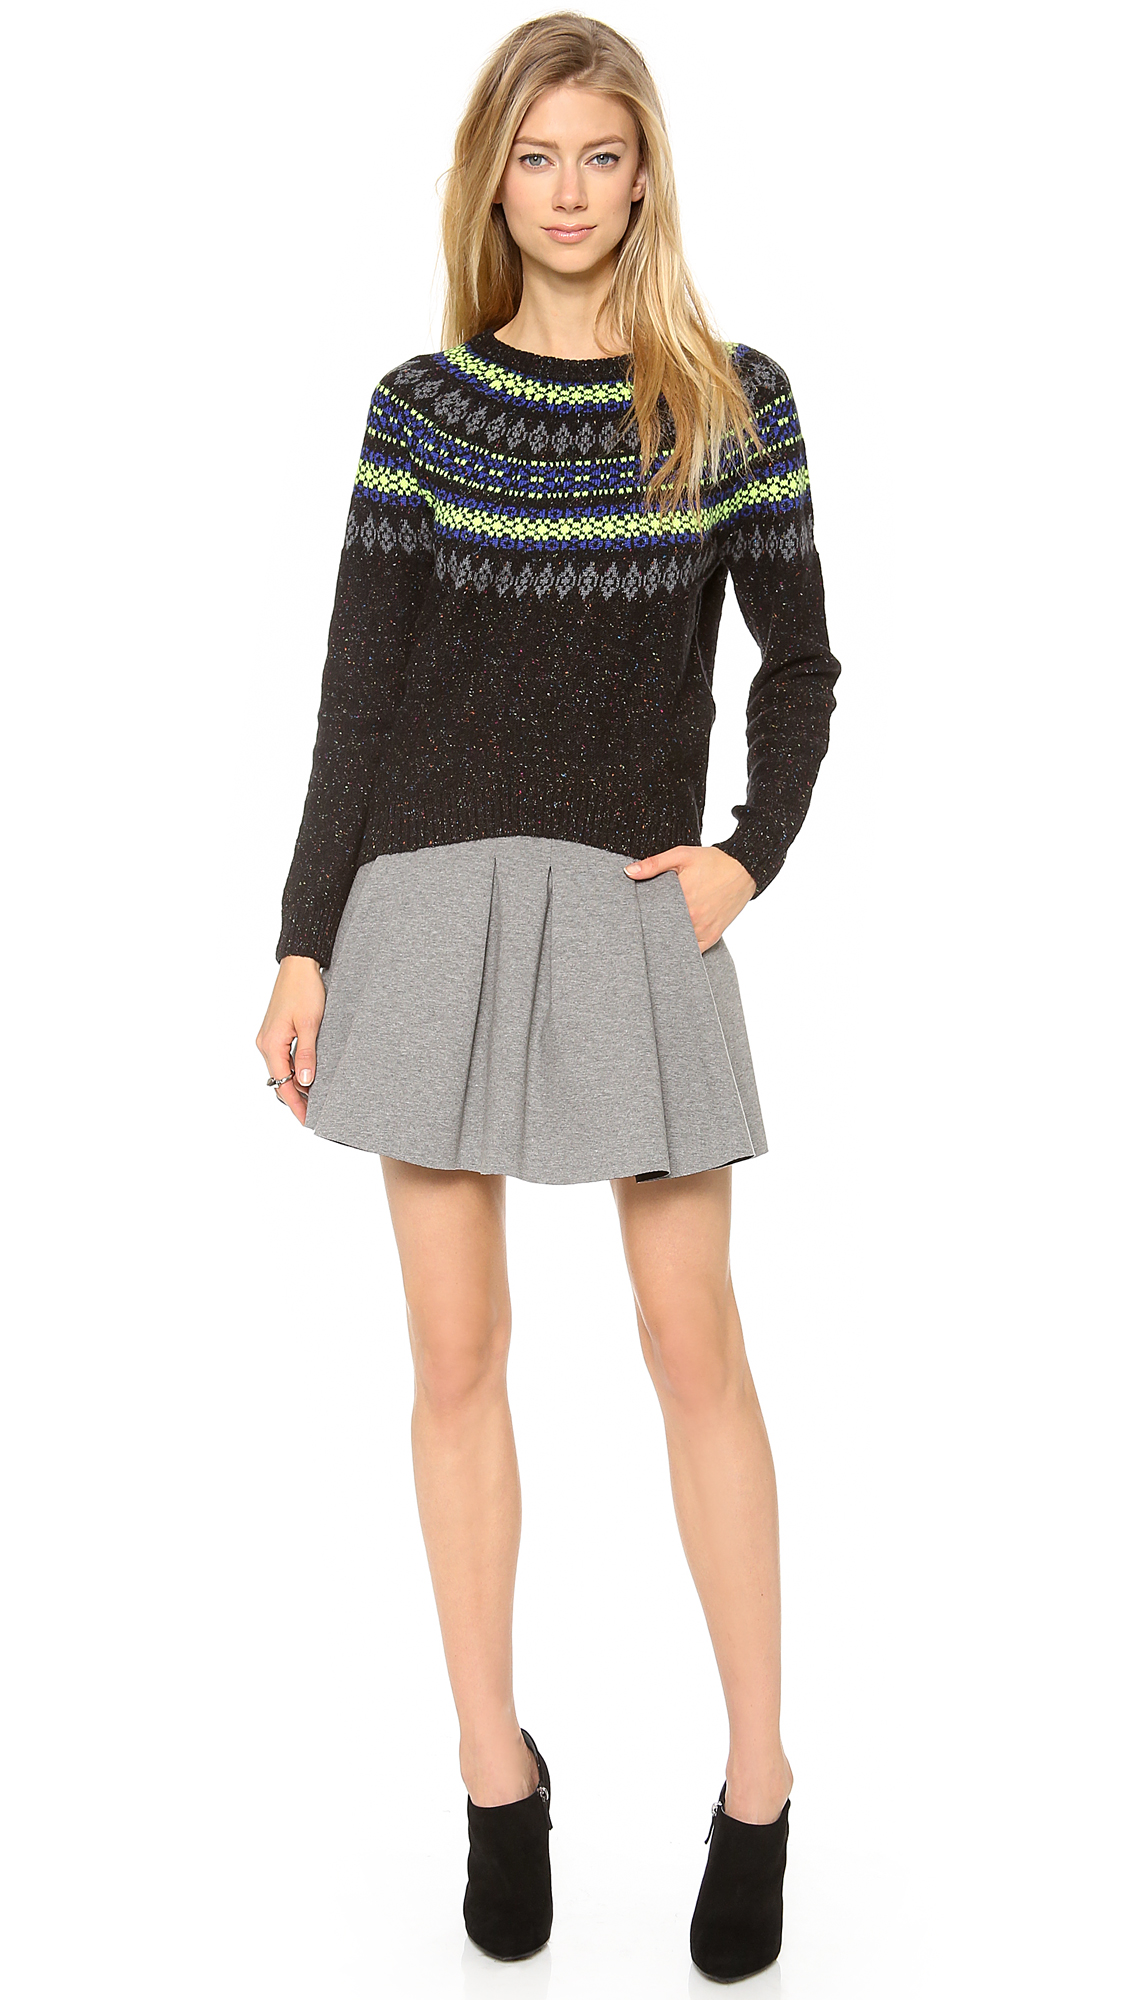 Milly Neon Fair Isle Sweater in Black | Lyst